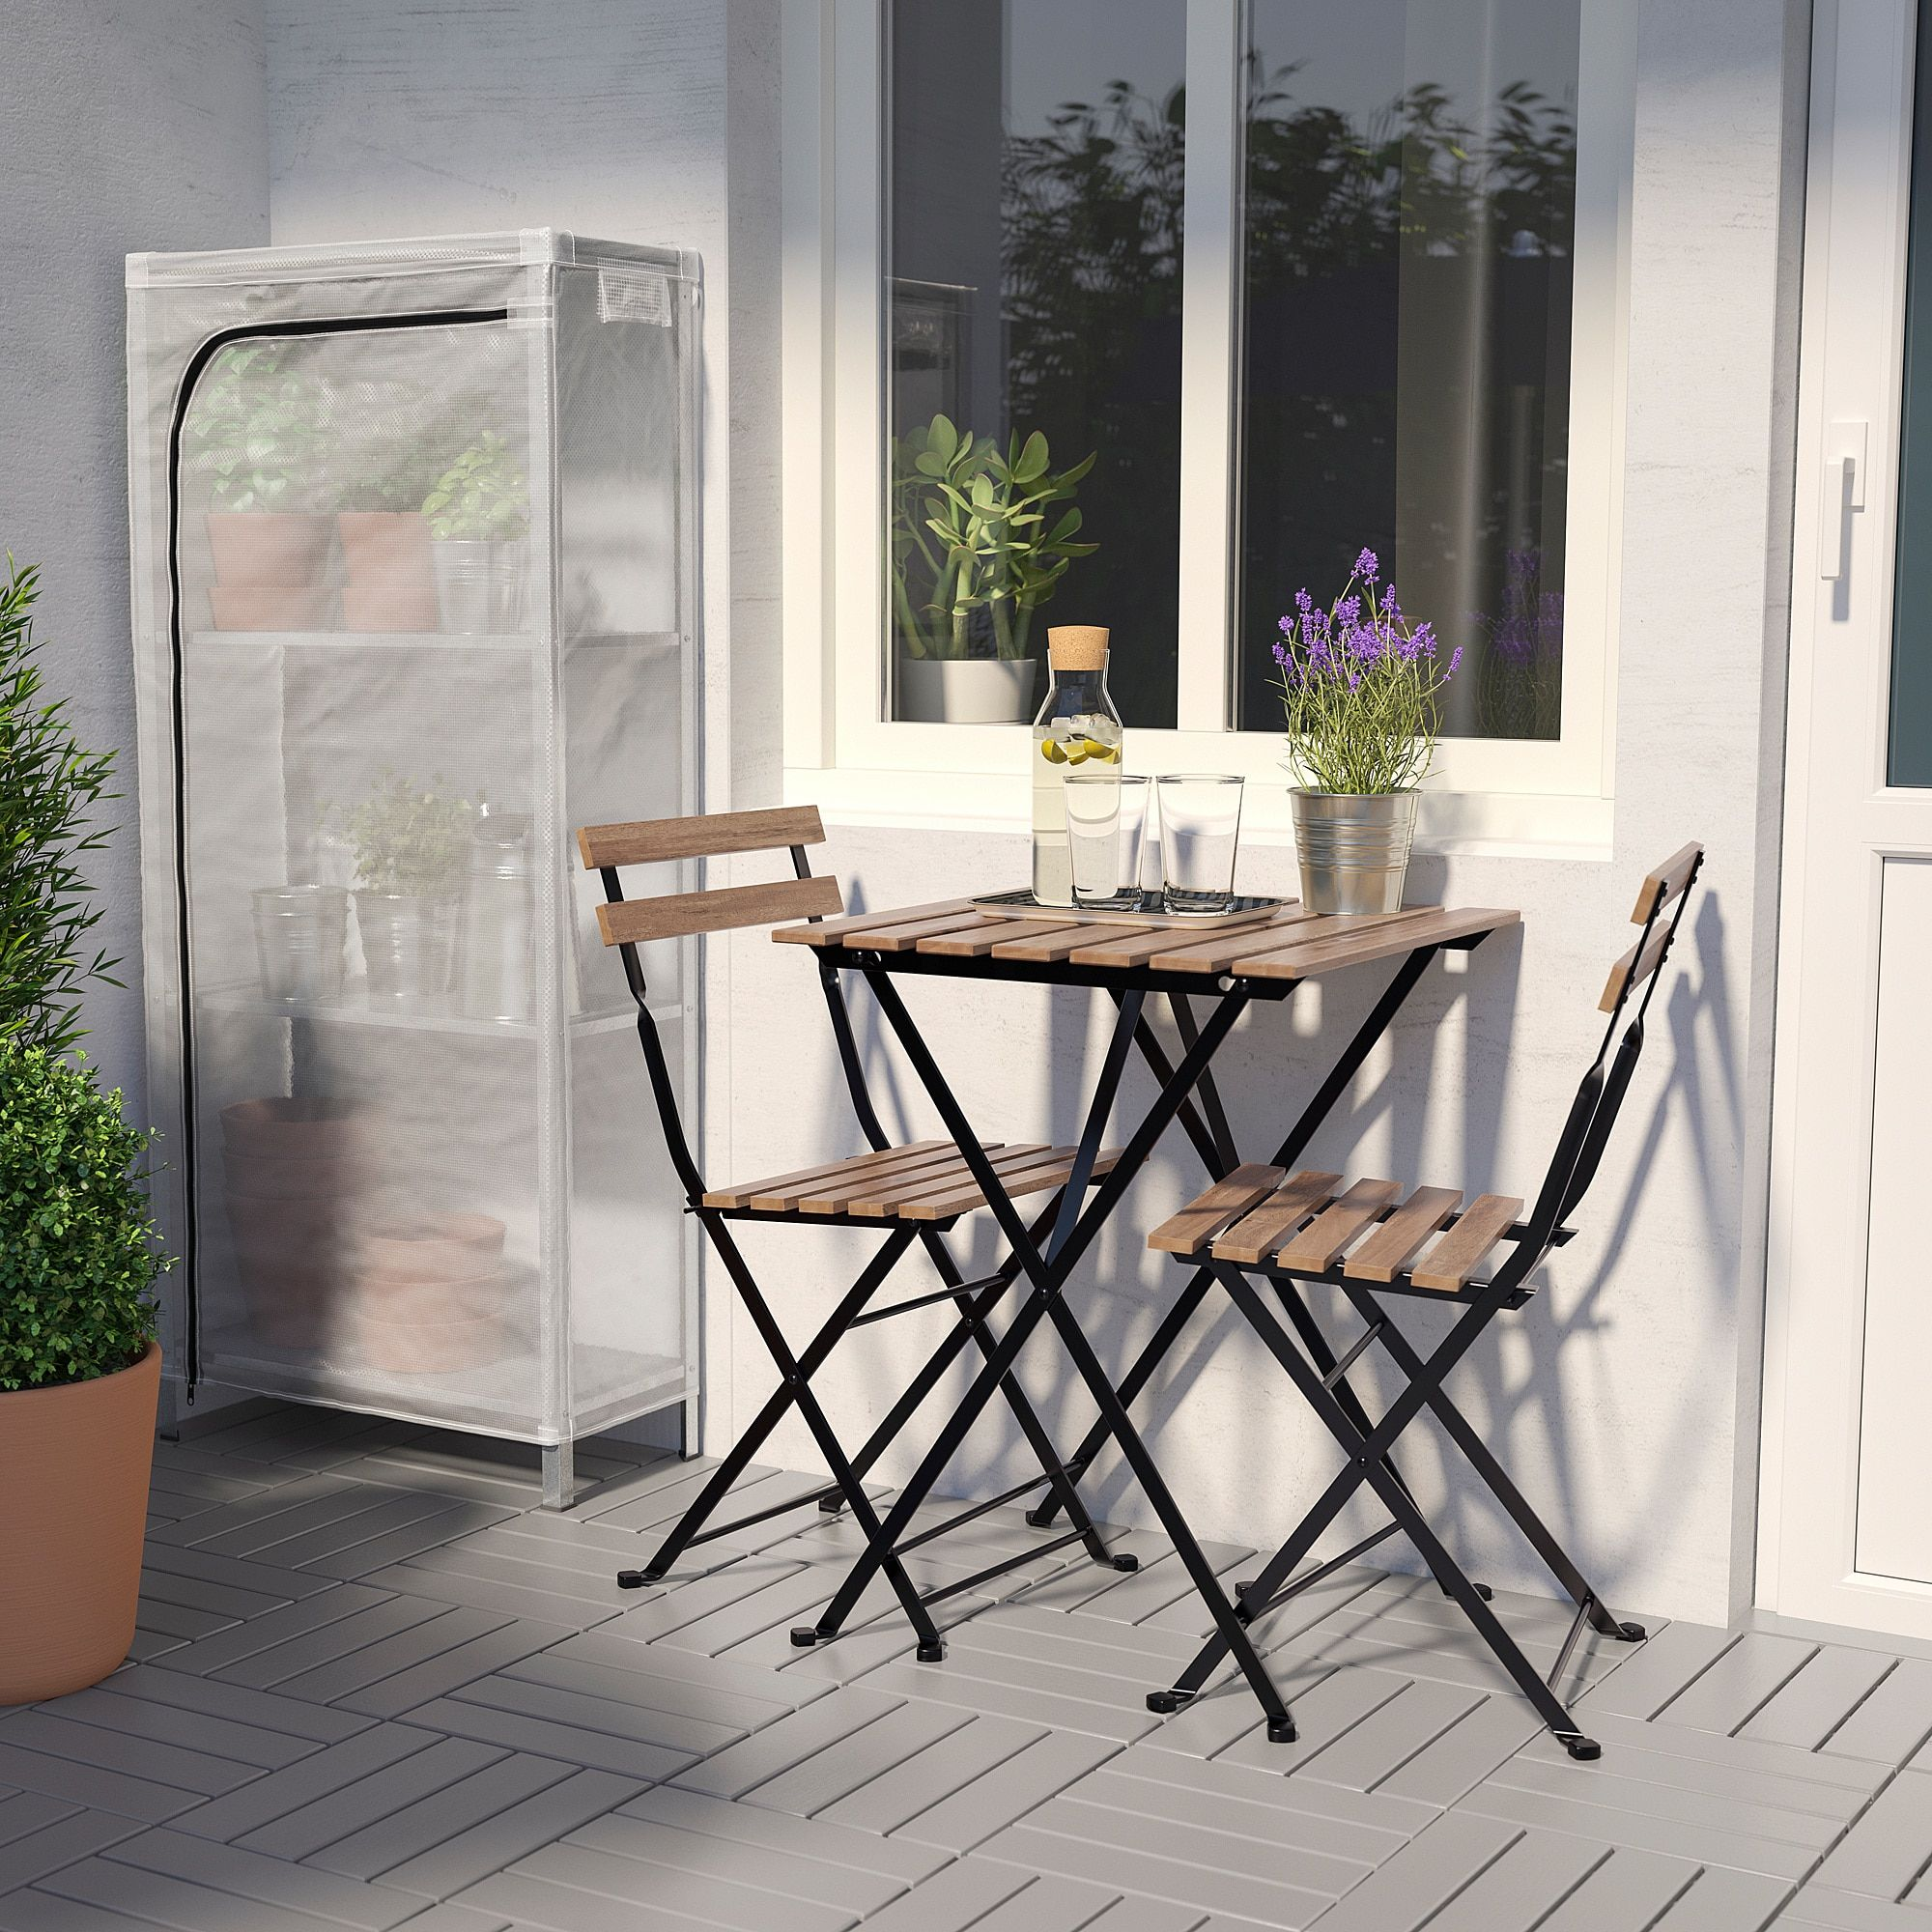 Ikea Hyllis Shelf Unit With Cover Transparent Outdoor Dining Furniture Ikea Furniture